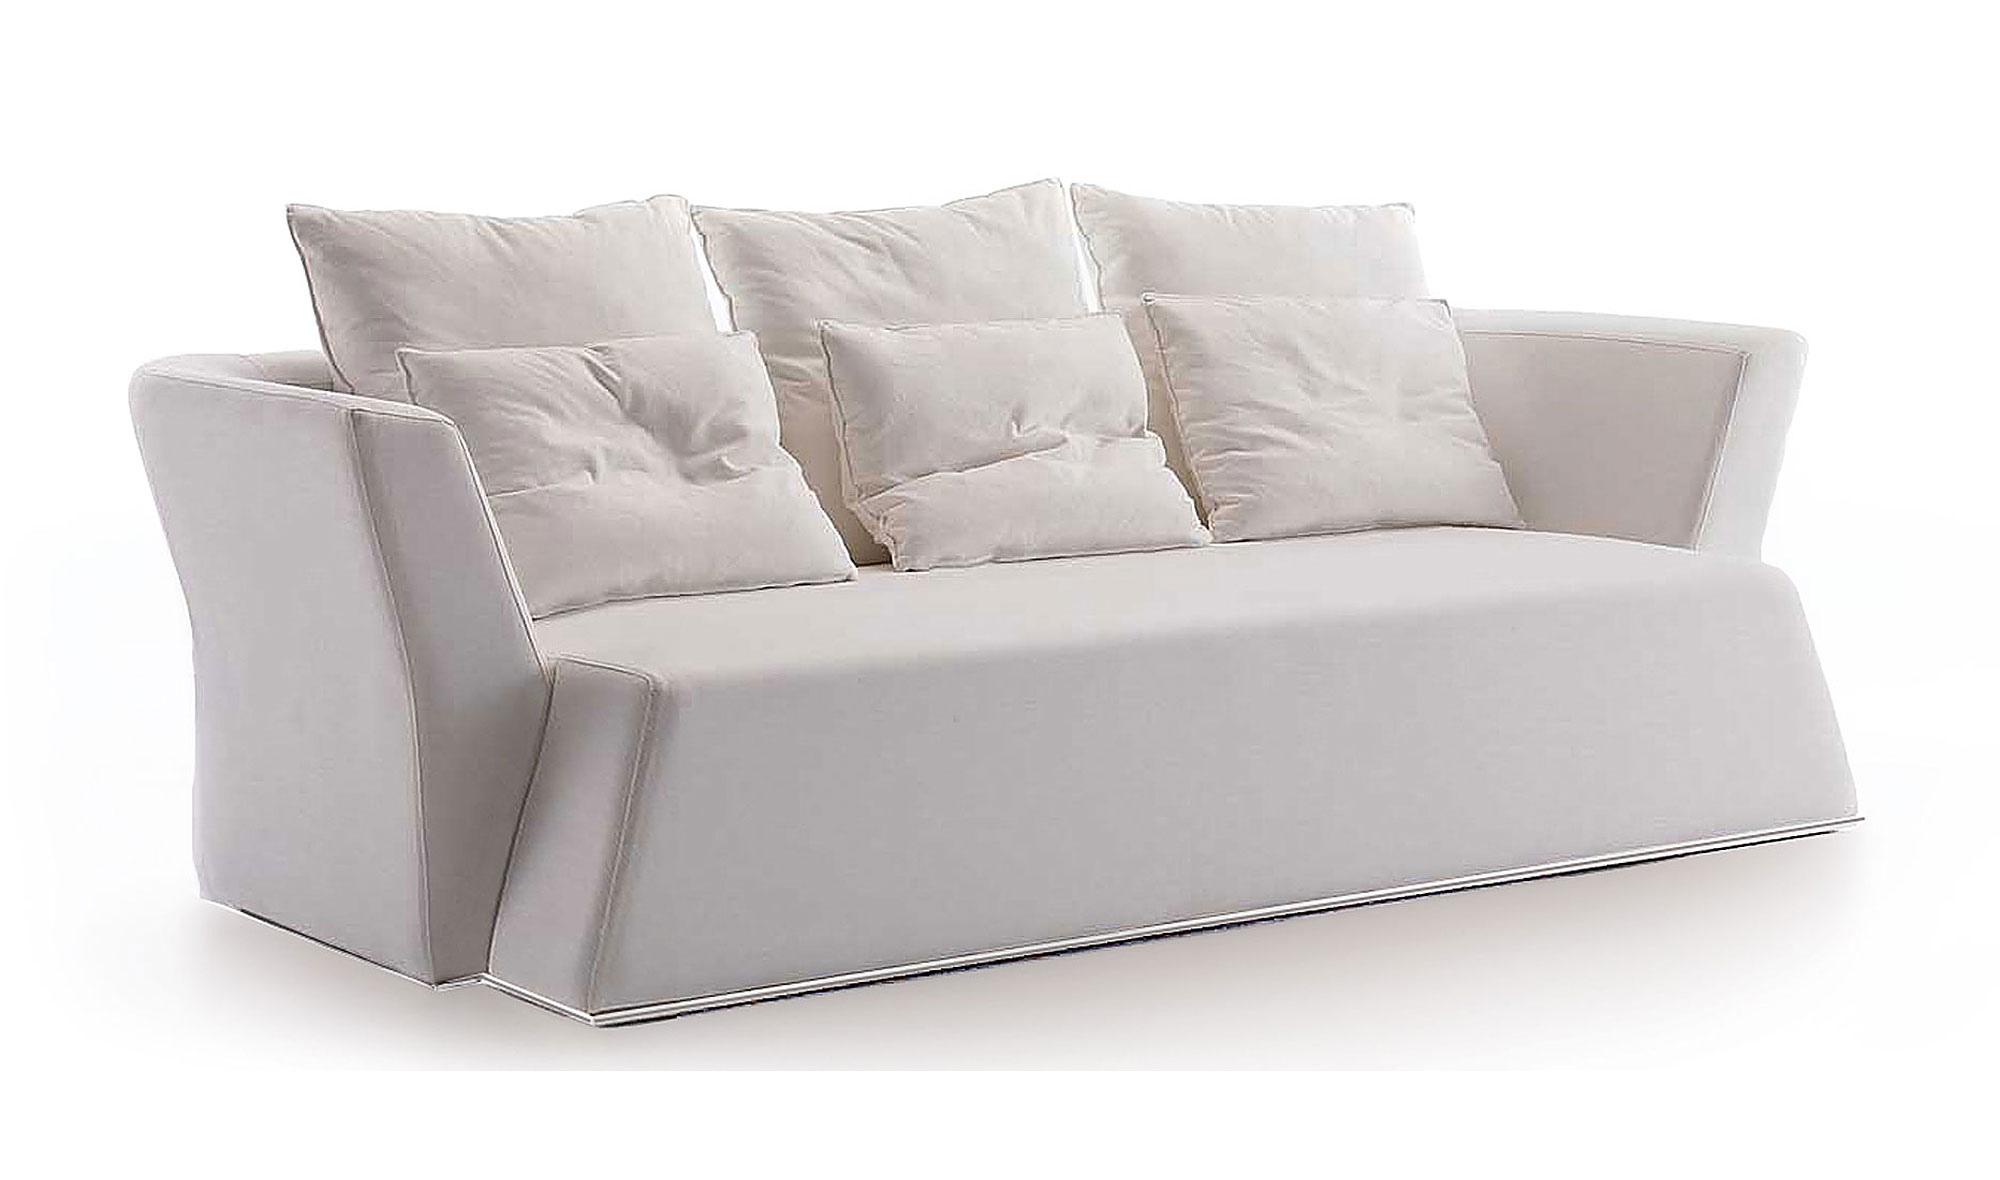 Sofa de diseño Arko